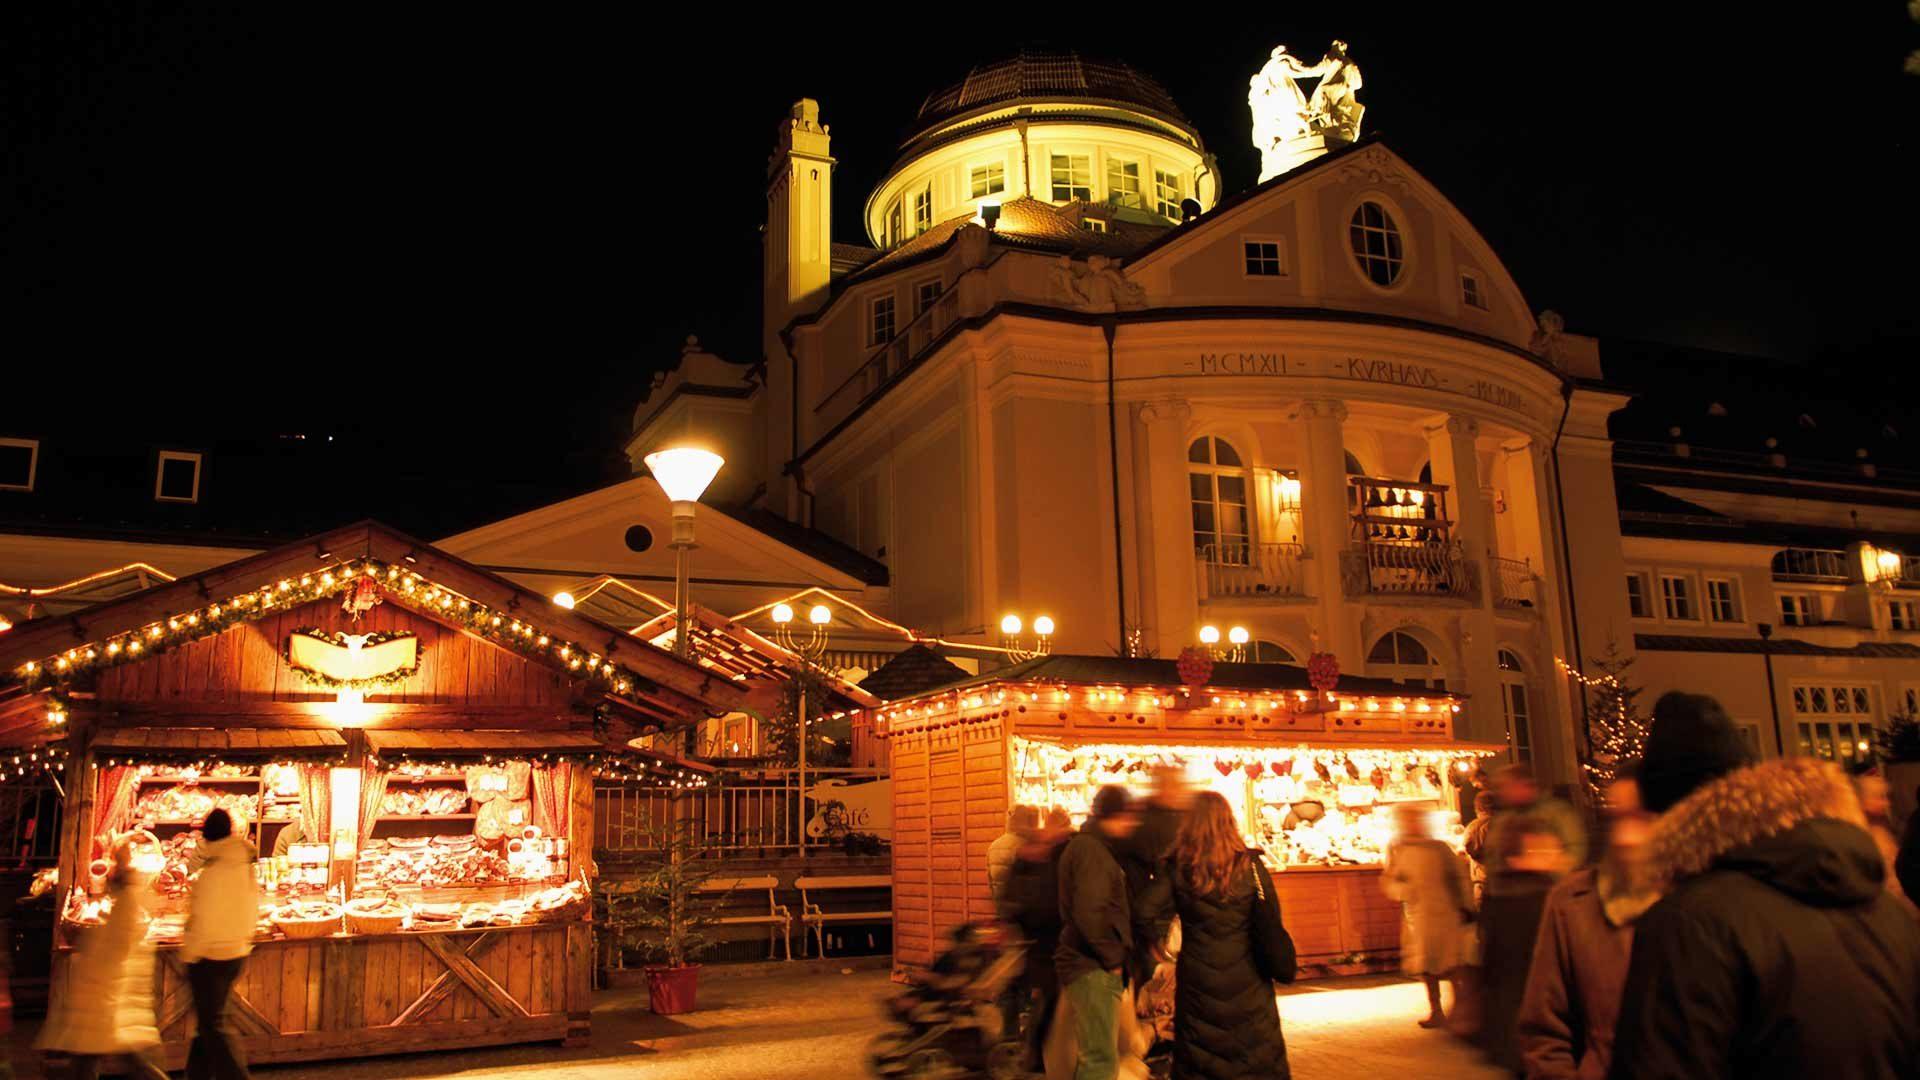 Mercatino di Natale - Atmosfera serale al Kurhaus